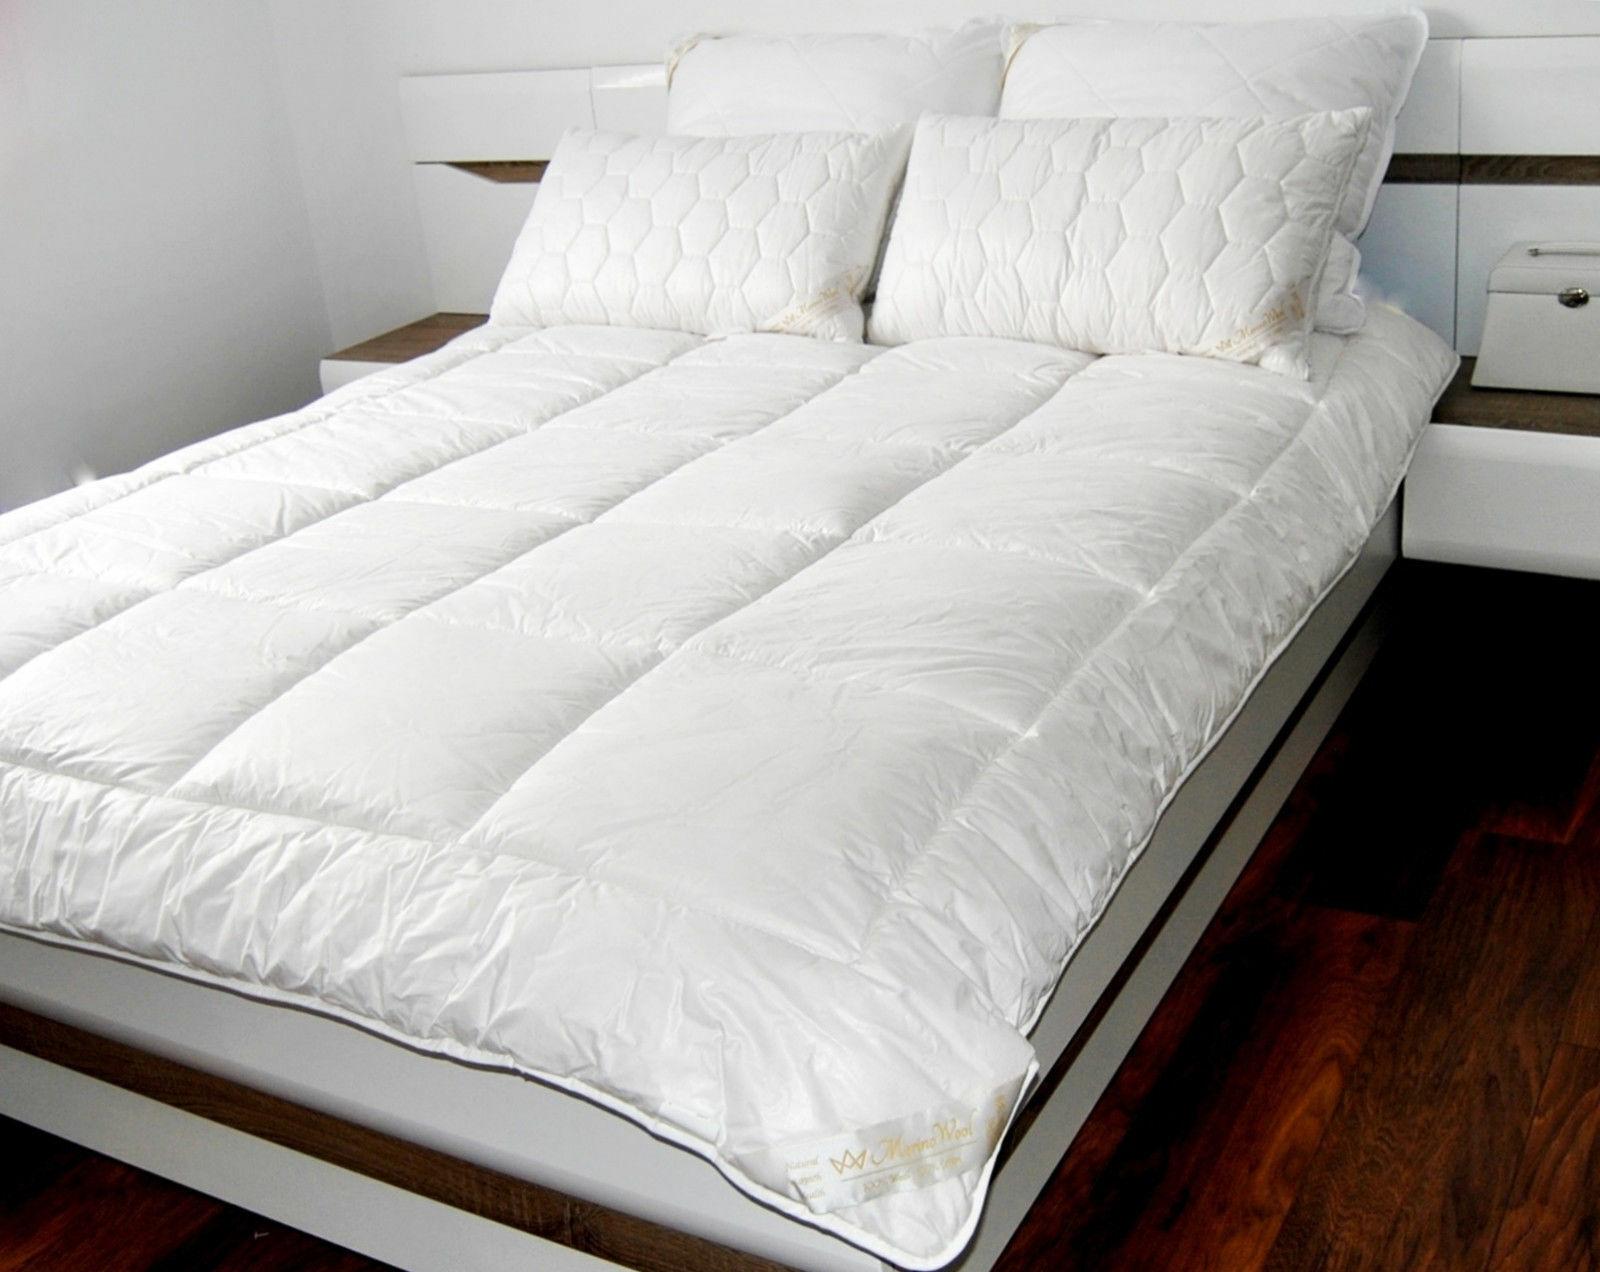 Single  Size Duvet 4 Tog Non Allergy Filling 150 x 200 cm Duved Bed